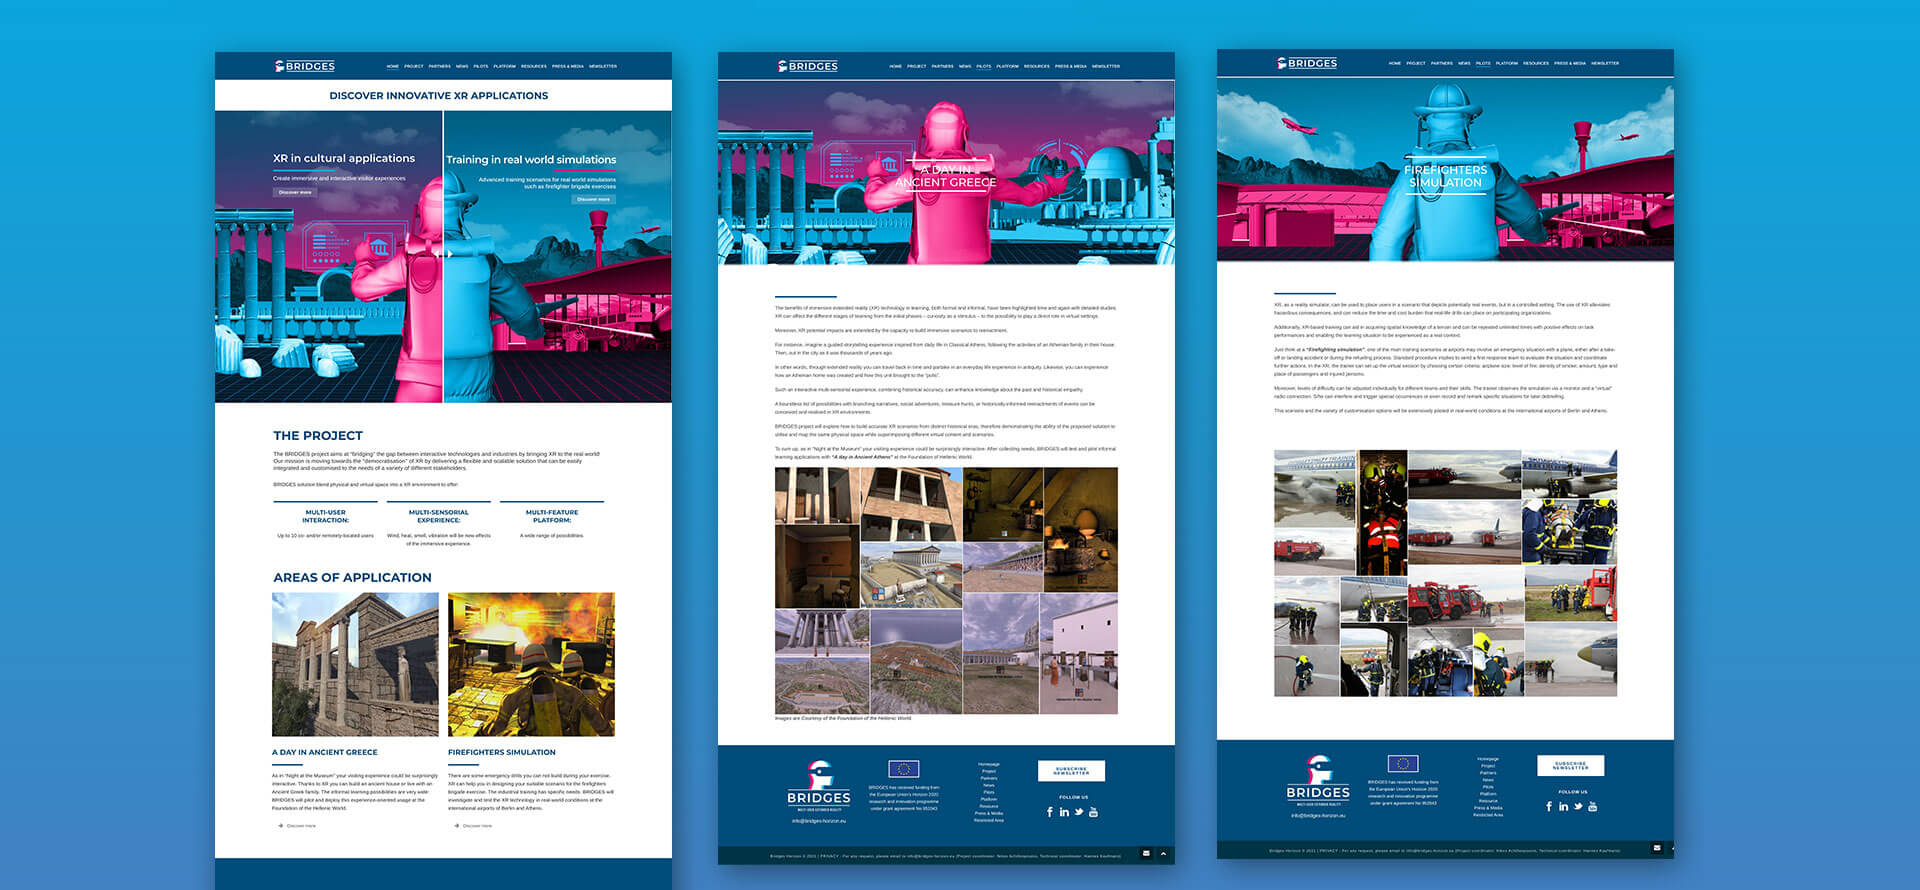 zerouno-design-Bridges-website2